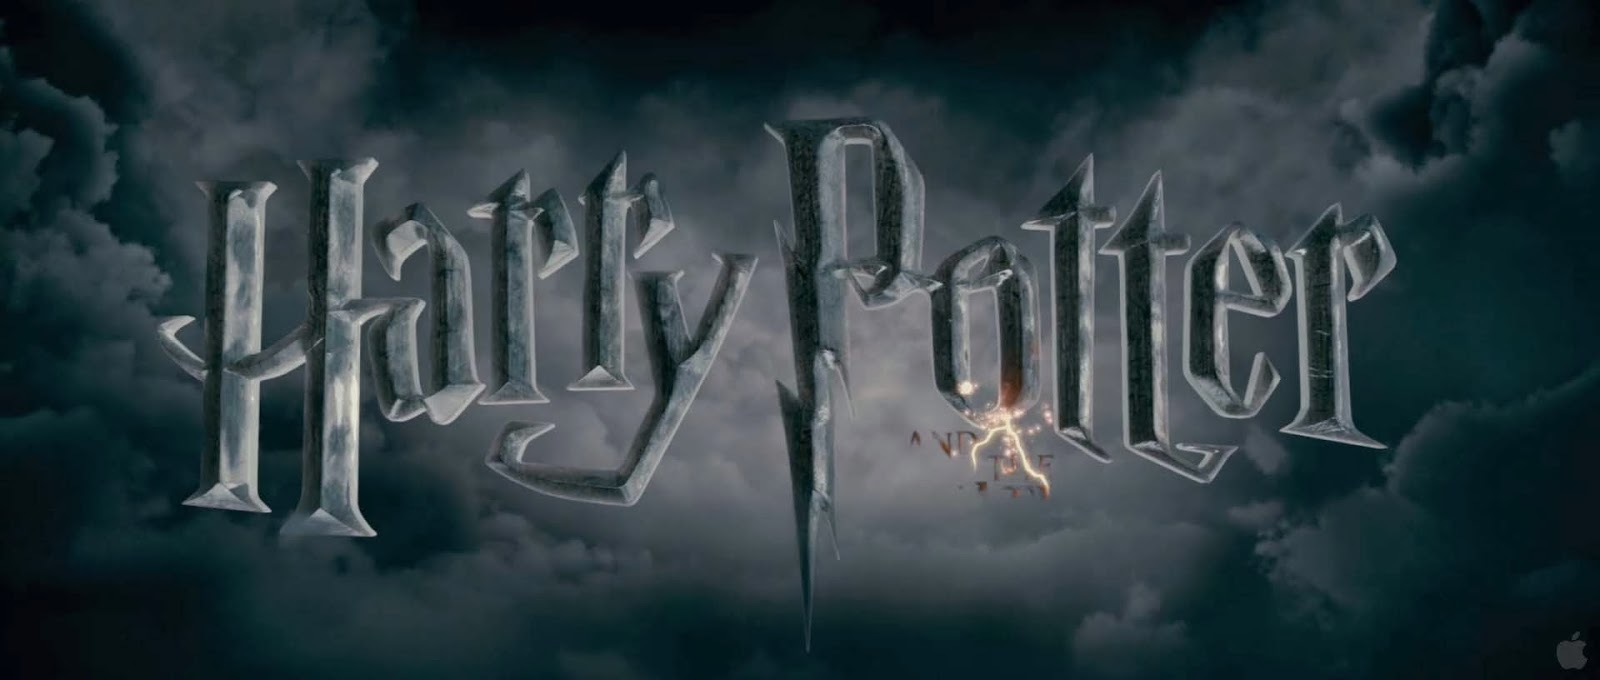 ver trailer harry potter 5: